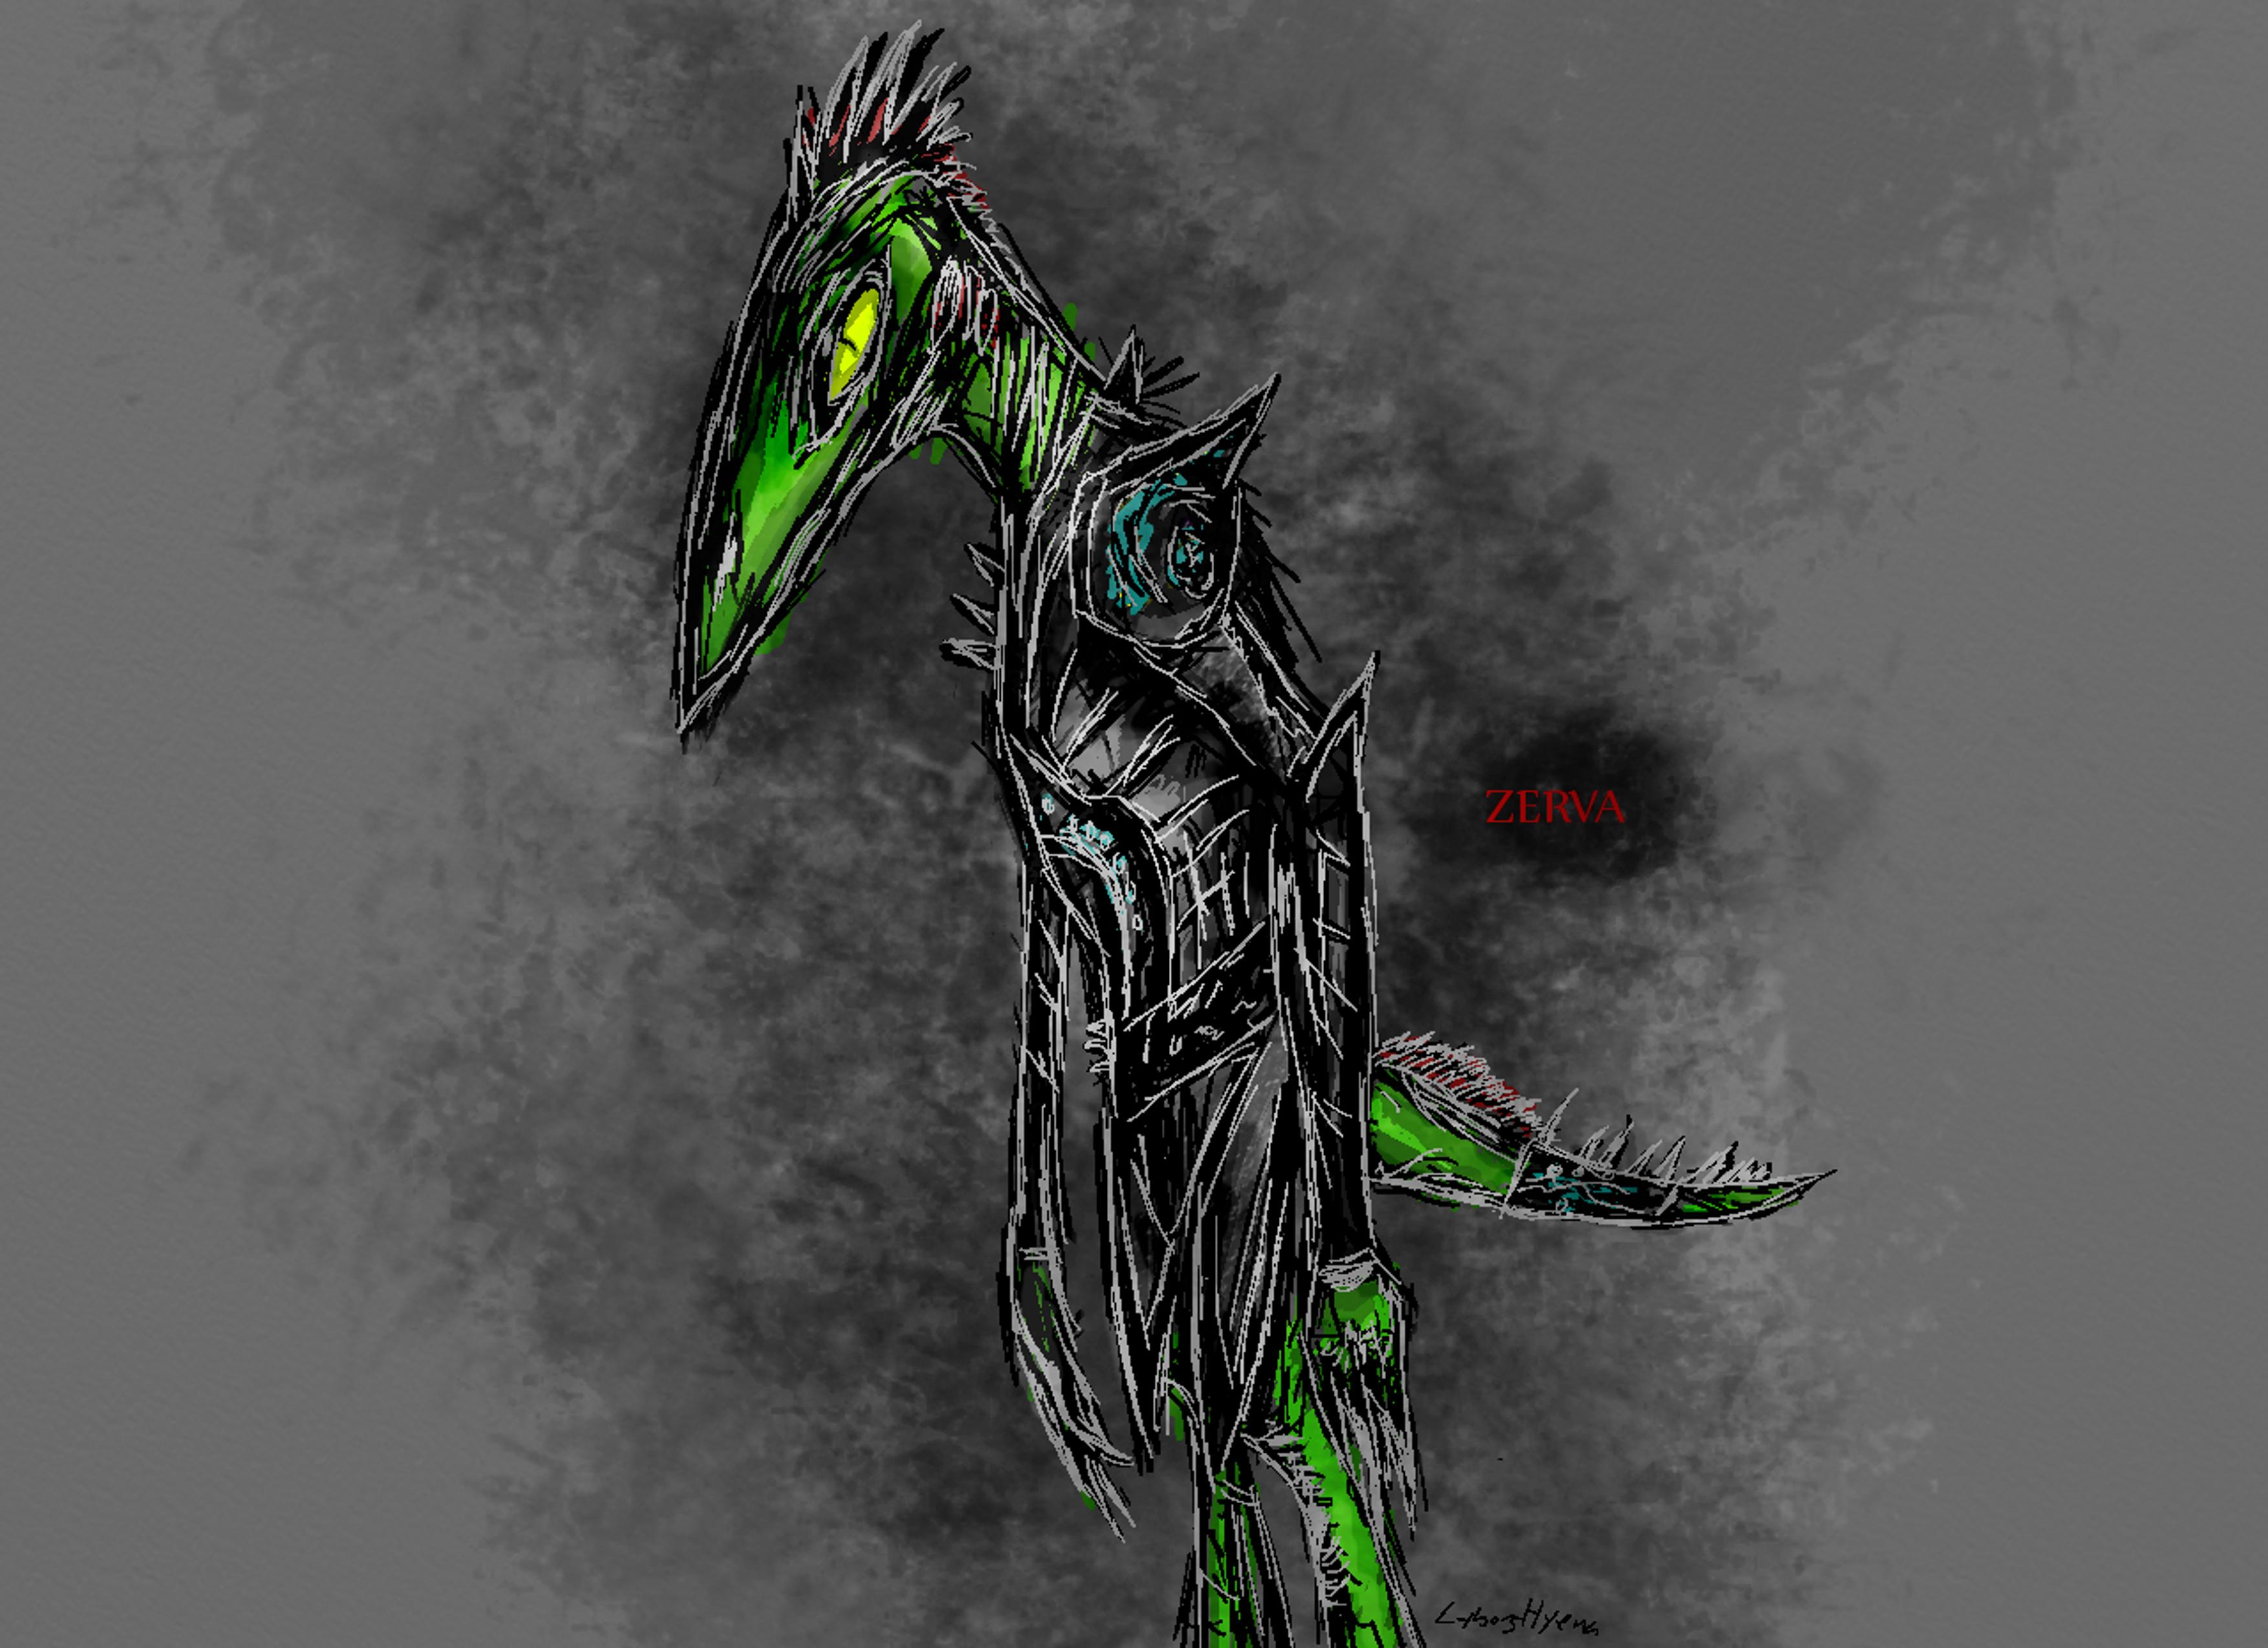 Zerva Soldier by cyborghyena